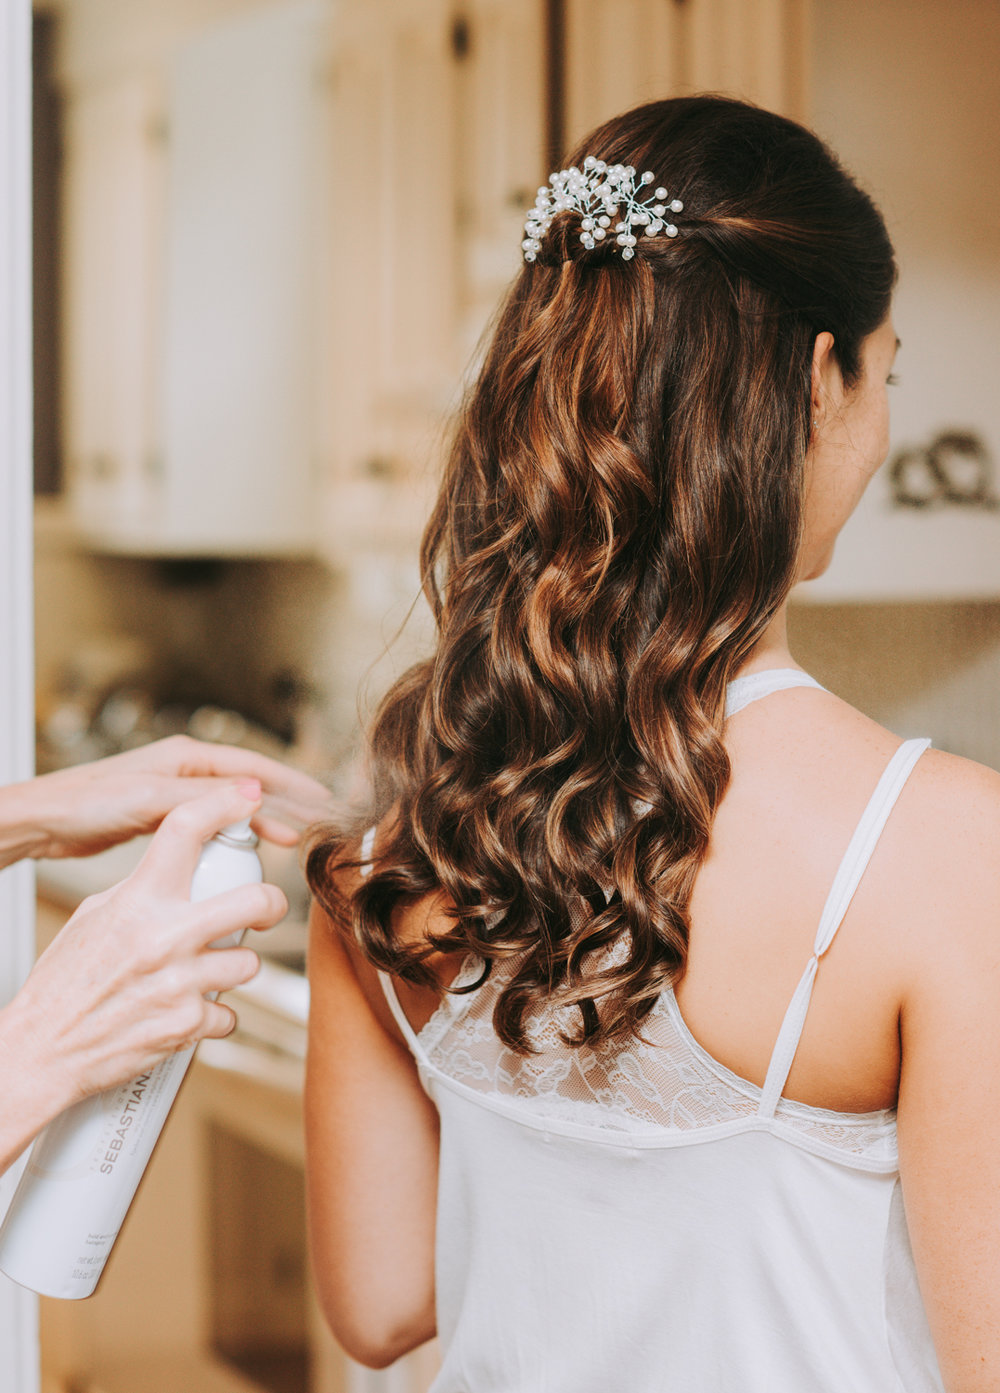 maureen_evan_wedding_marthas_vineyard_getting_ready-2893.jpg